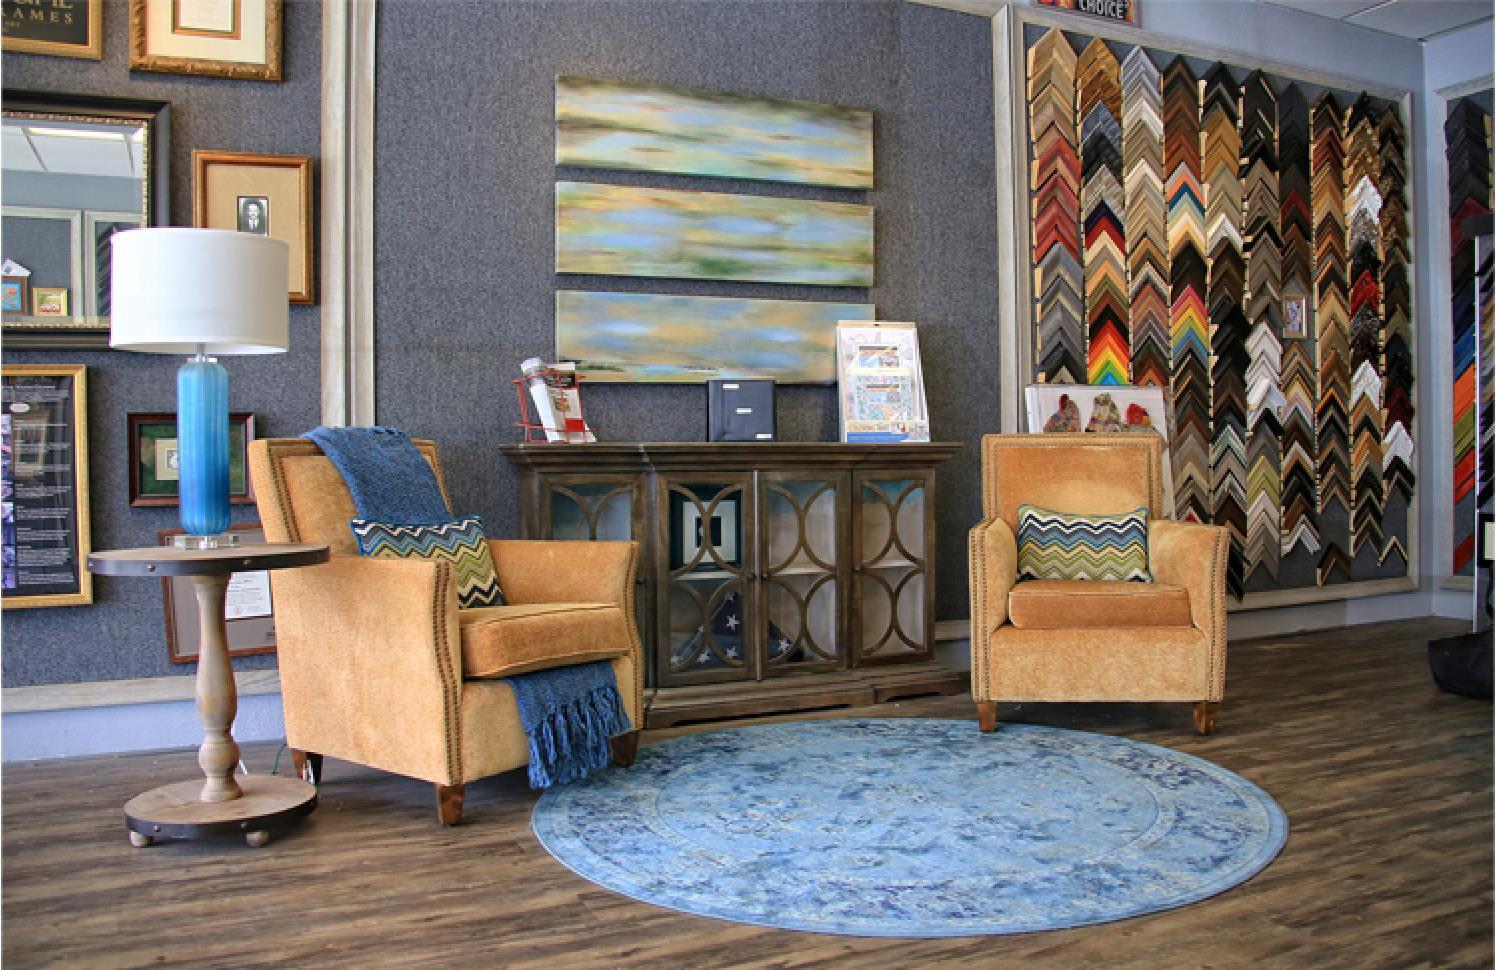 EXPRESS Art and Frame reviews | Arts & Crafts at 3112 E Camelback Rd - Phoenix AZ